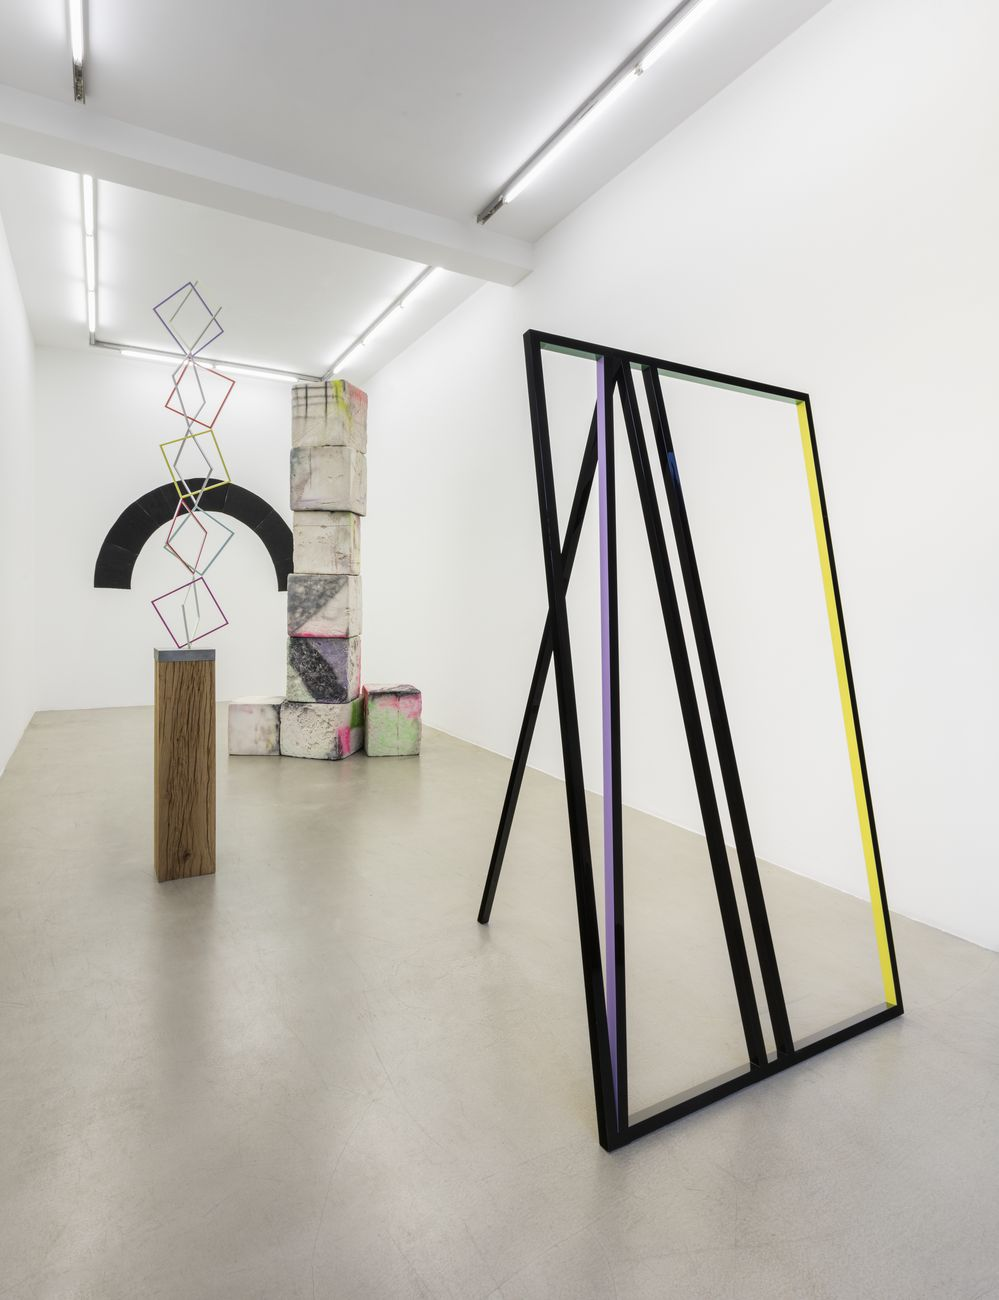 Eva Rothschild. Exhibition view at kaufmann repetto, Milano 2017. Courtesy of the artist and kaufmann repetto, Milano New York. Photo Andrea Rossetti